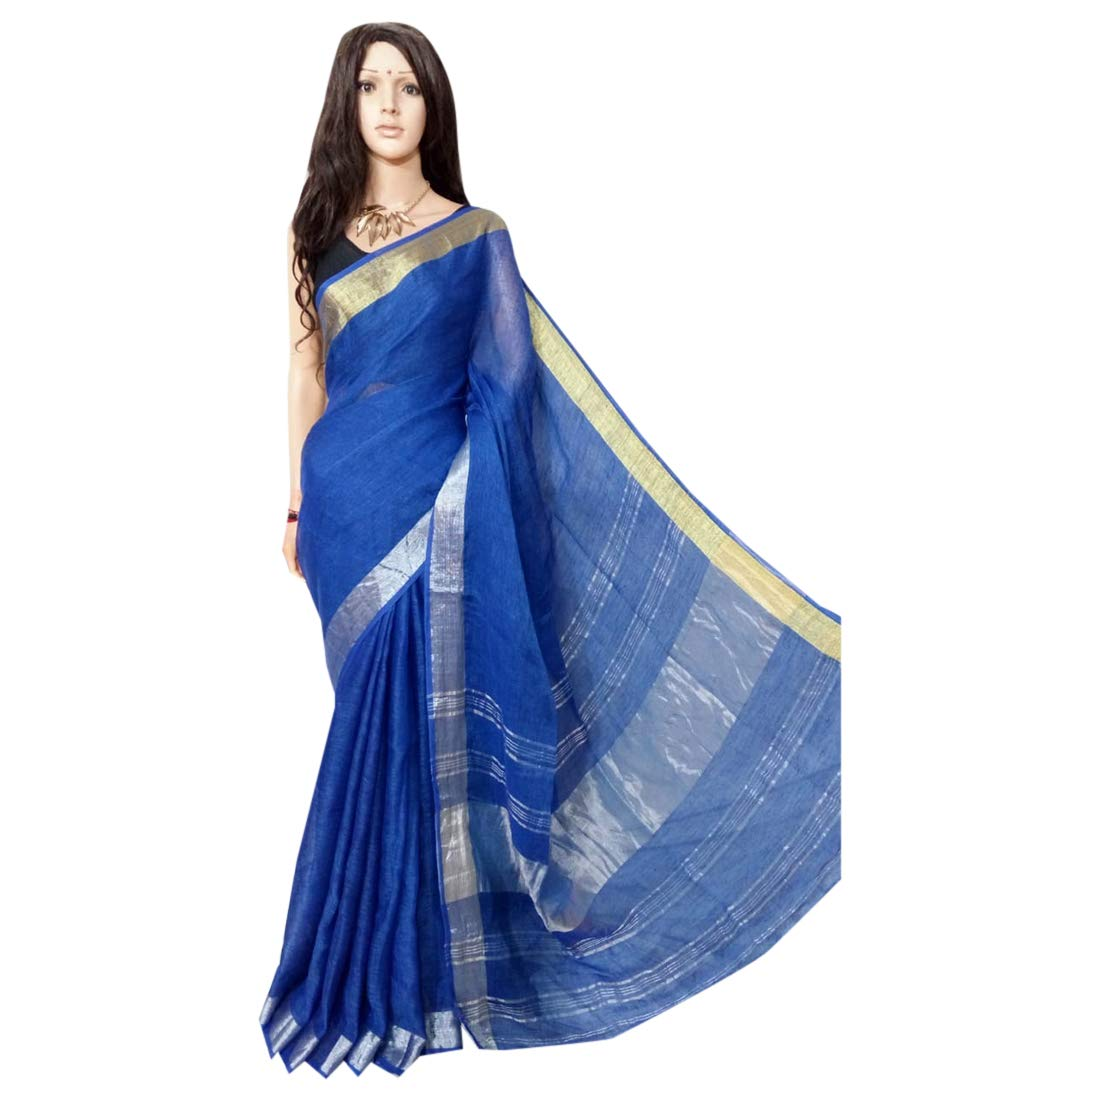 Indian Saree Ethnic bluee Pure Linen Jamdani Handloom Sari Designer Collection Sari Party Formal Women Wear 109a